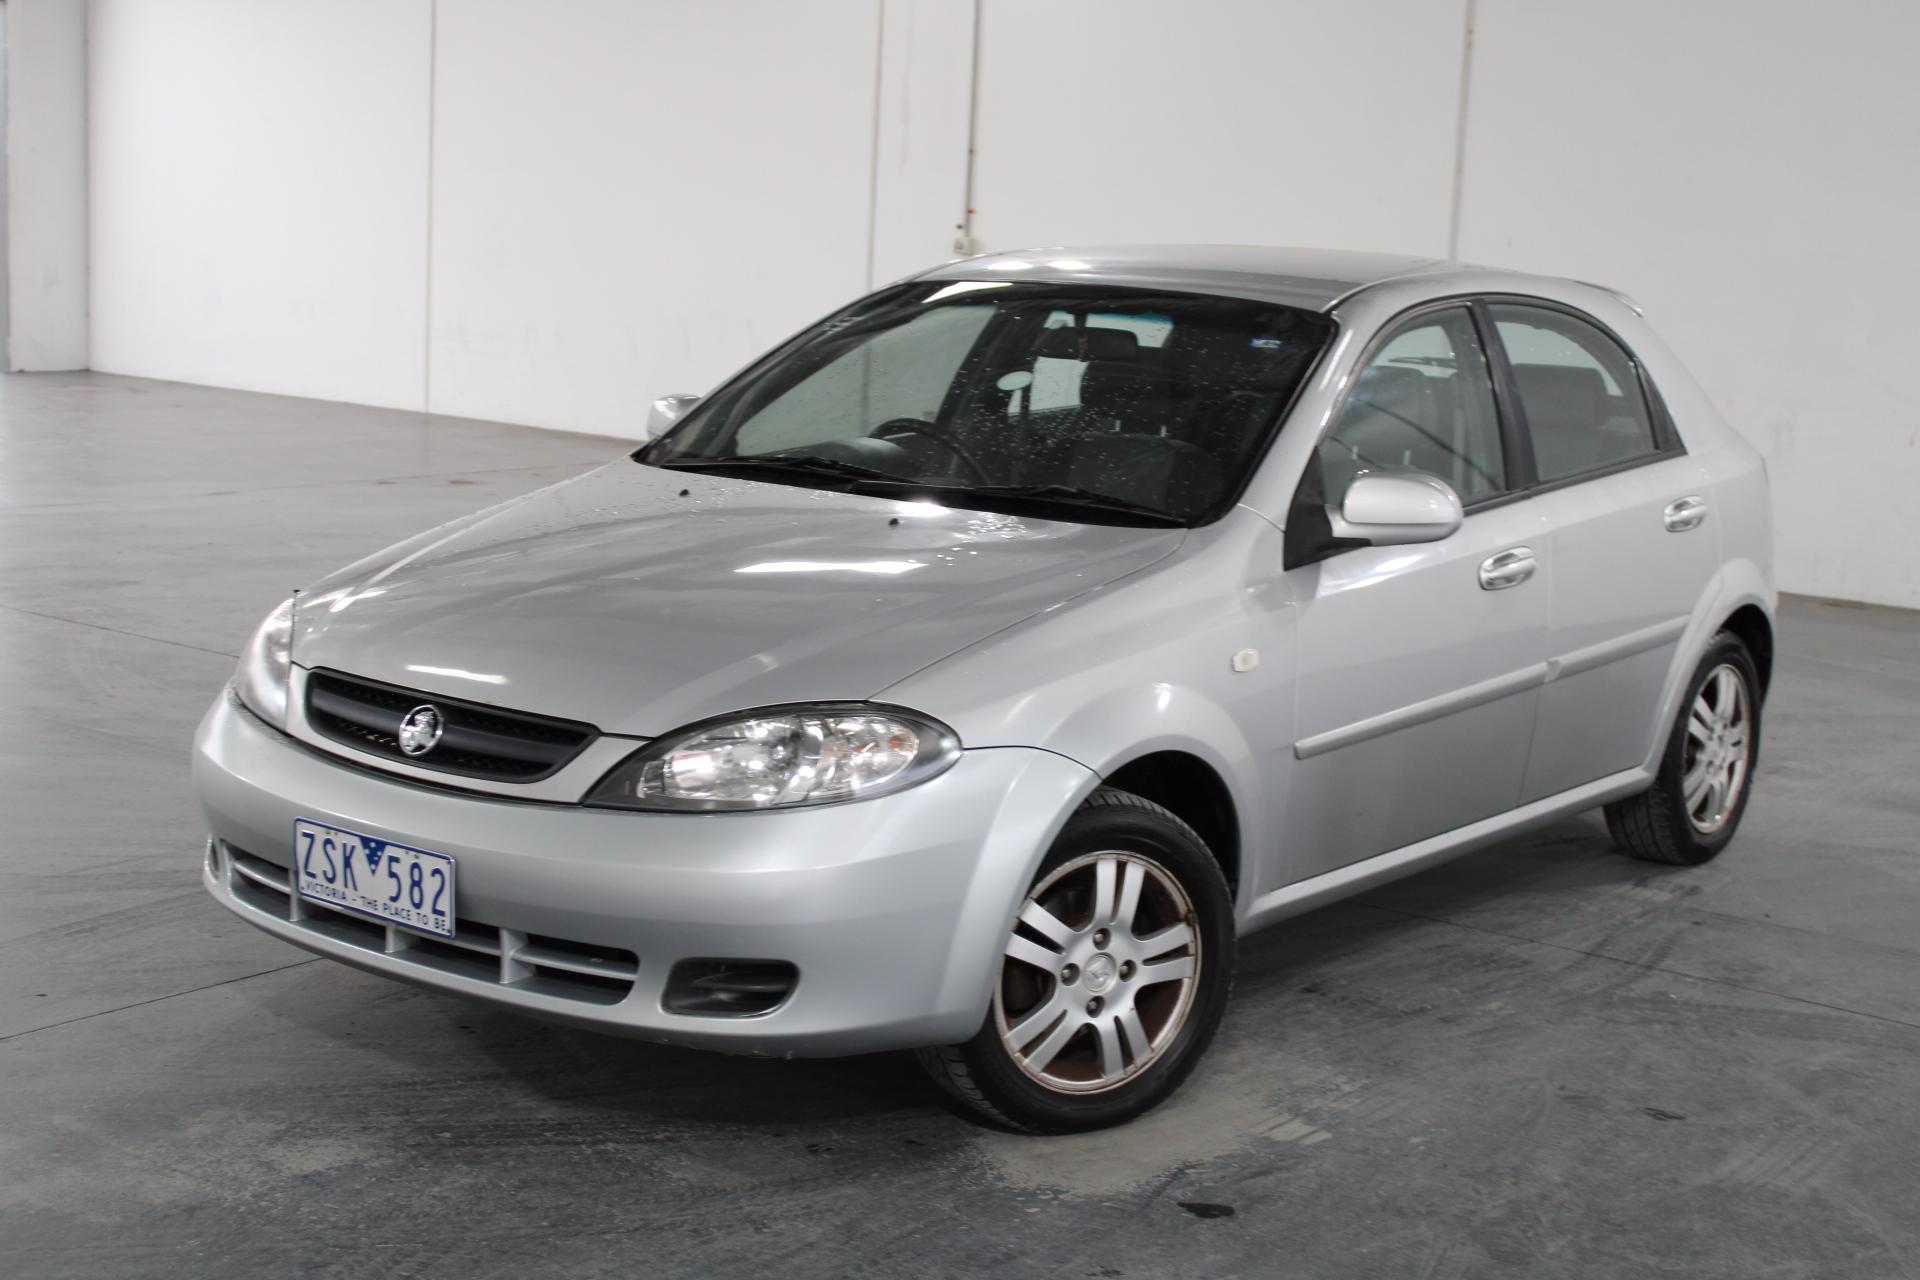 2006 Holden Viva Equipe JF Automatic Hatchback